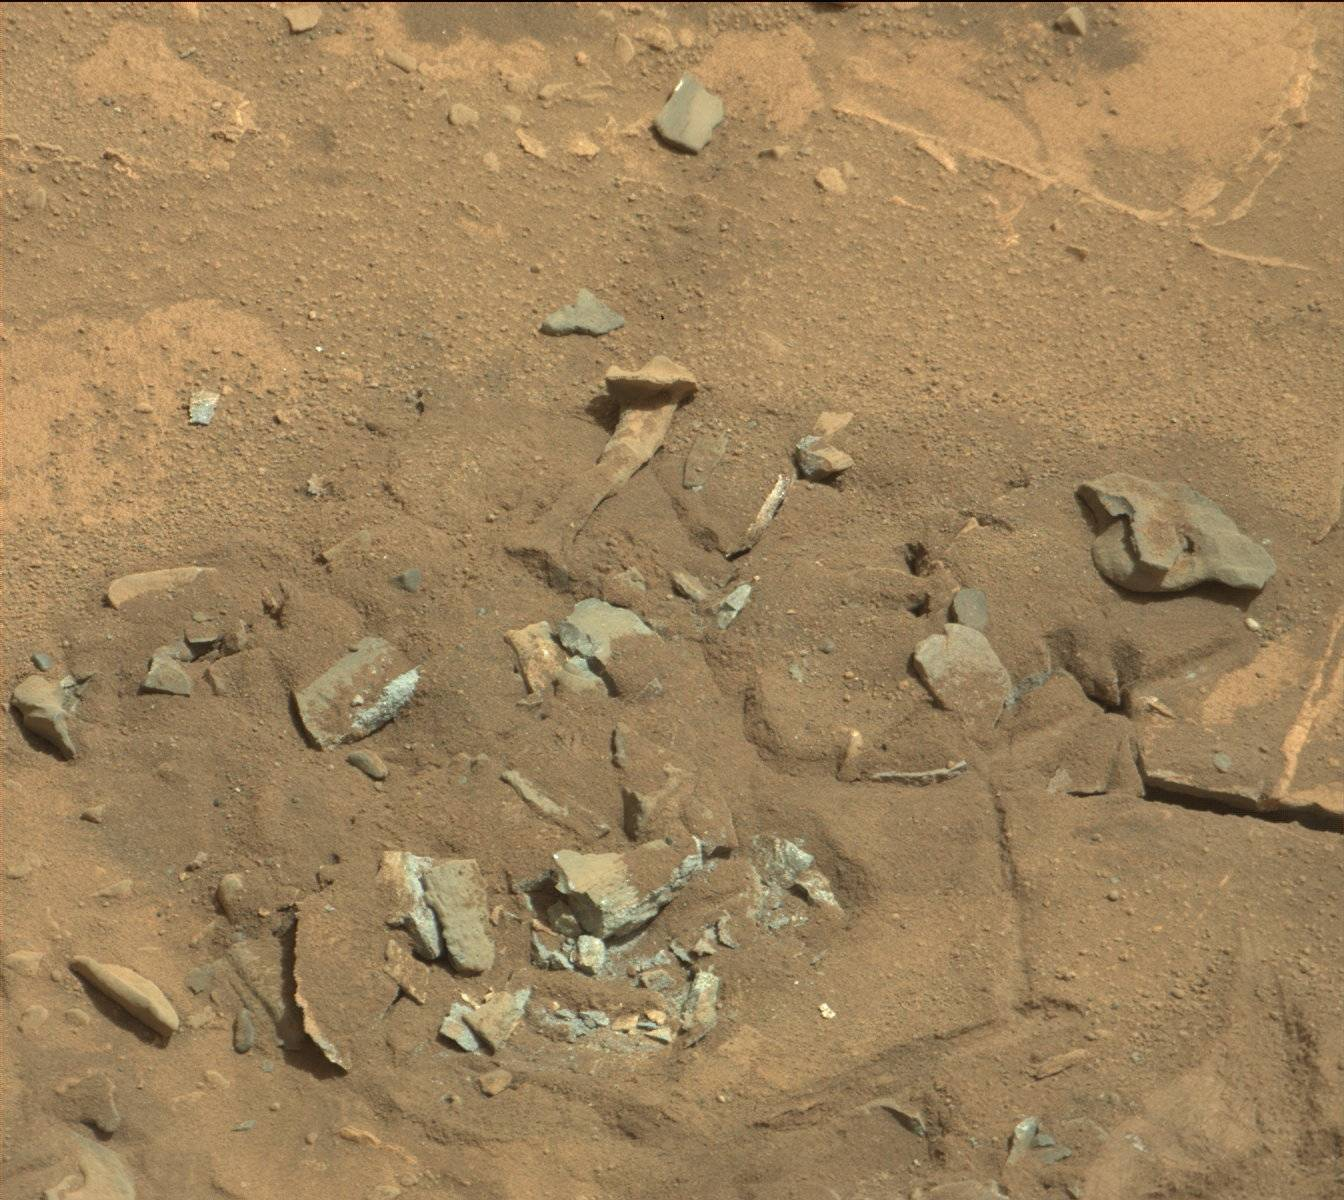 Mars-fossil-thigh-femur-bone-like-Curiosity-rover-mastcam-0719MR0030550060402769E01_DXXX-full